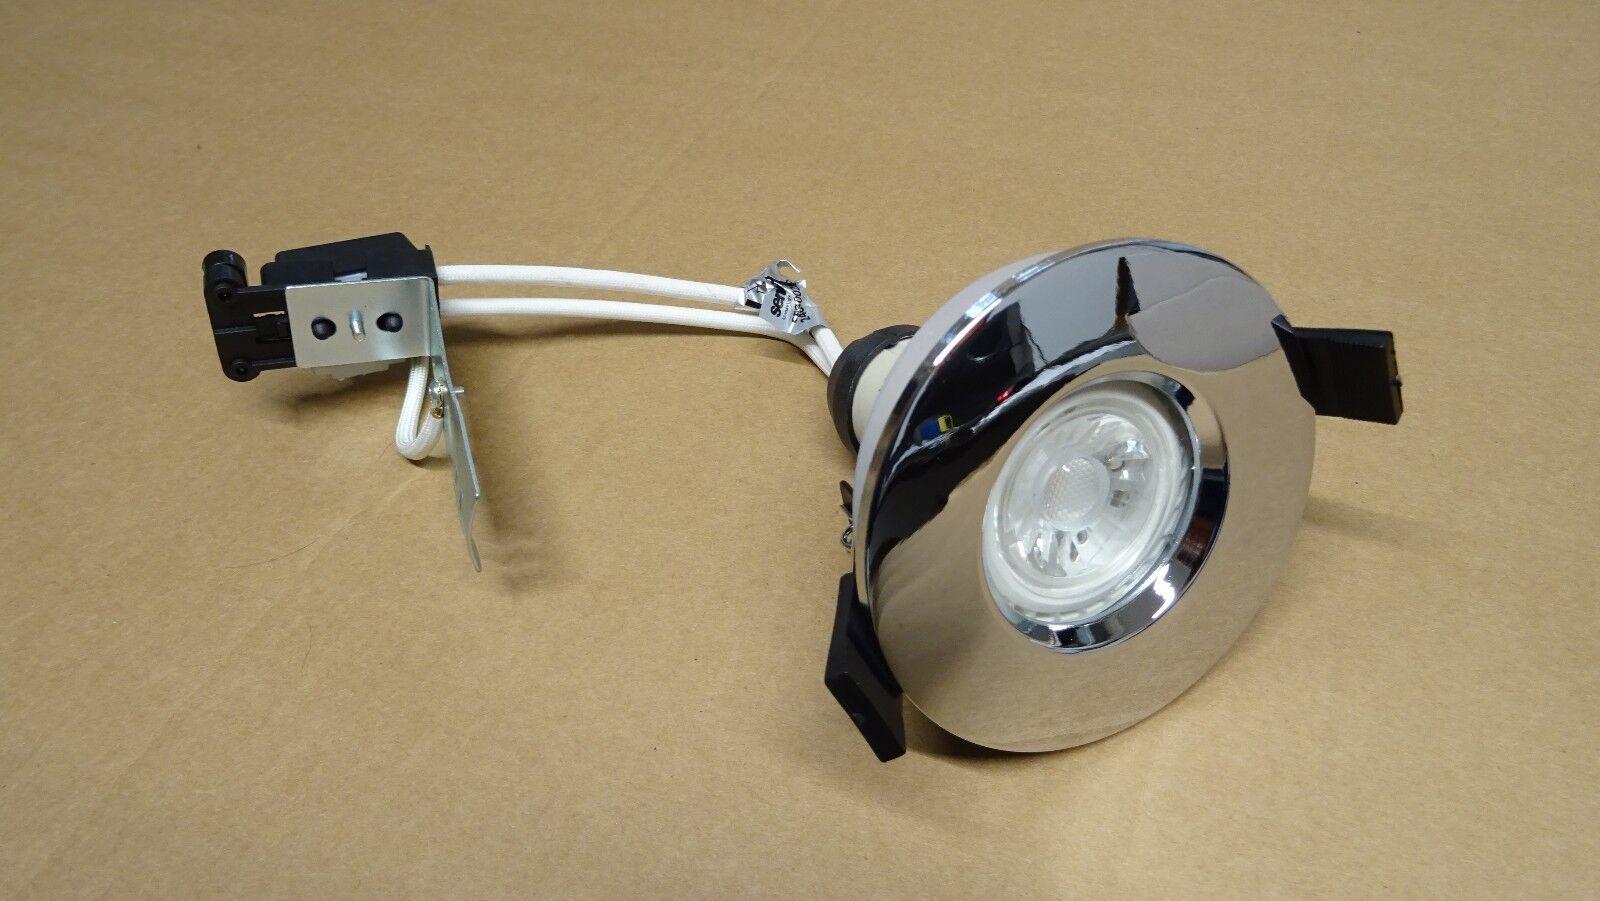 SENSIO doccia bagno soffitto proiettorino DA INCASSO FARETTO 240 V V V GU10 IP65 + lampadina LED 8c9c74